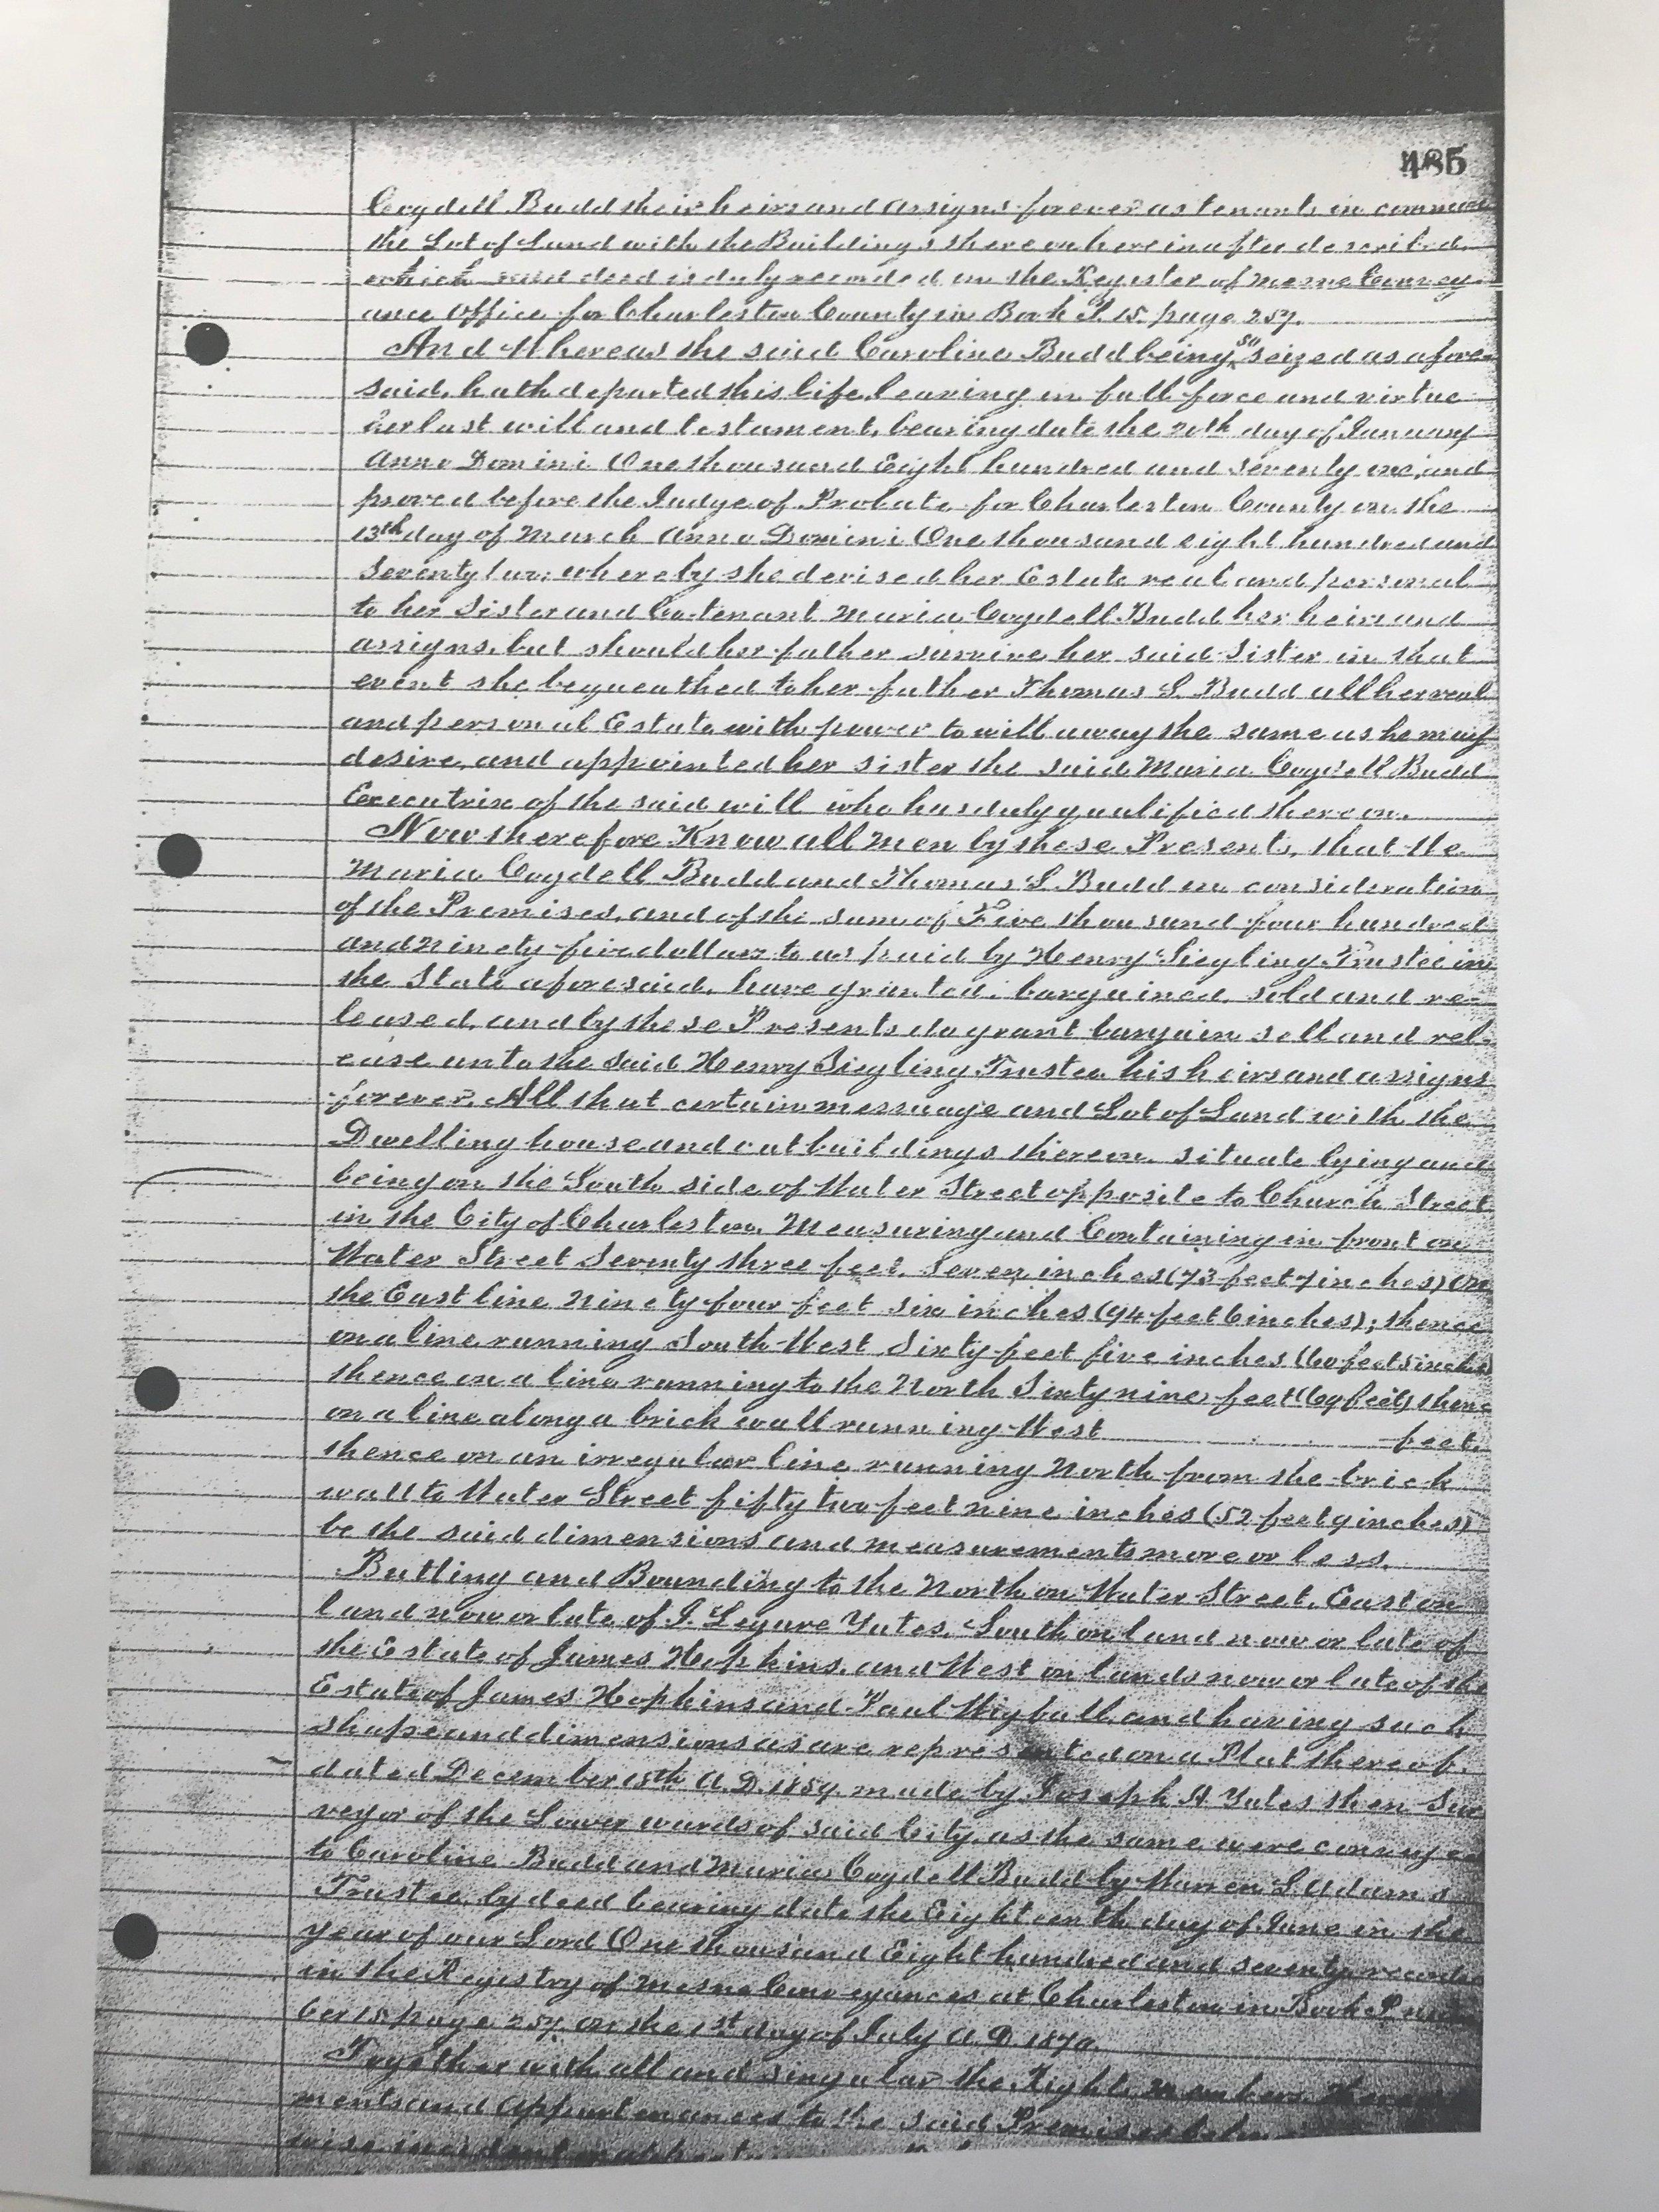 Deed Budd to Siegling page 1.JPG